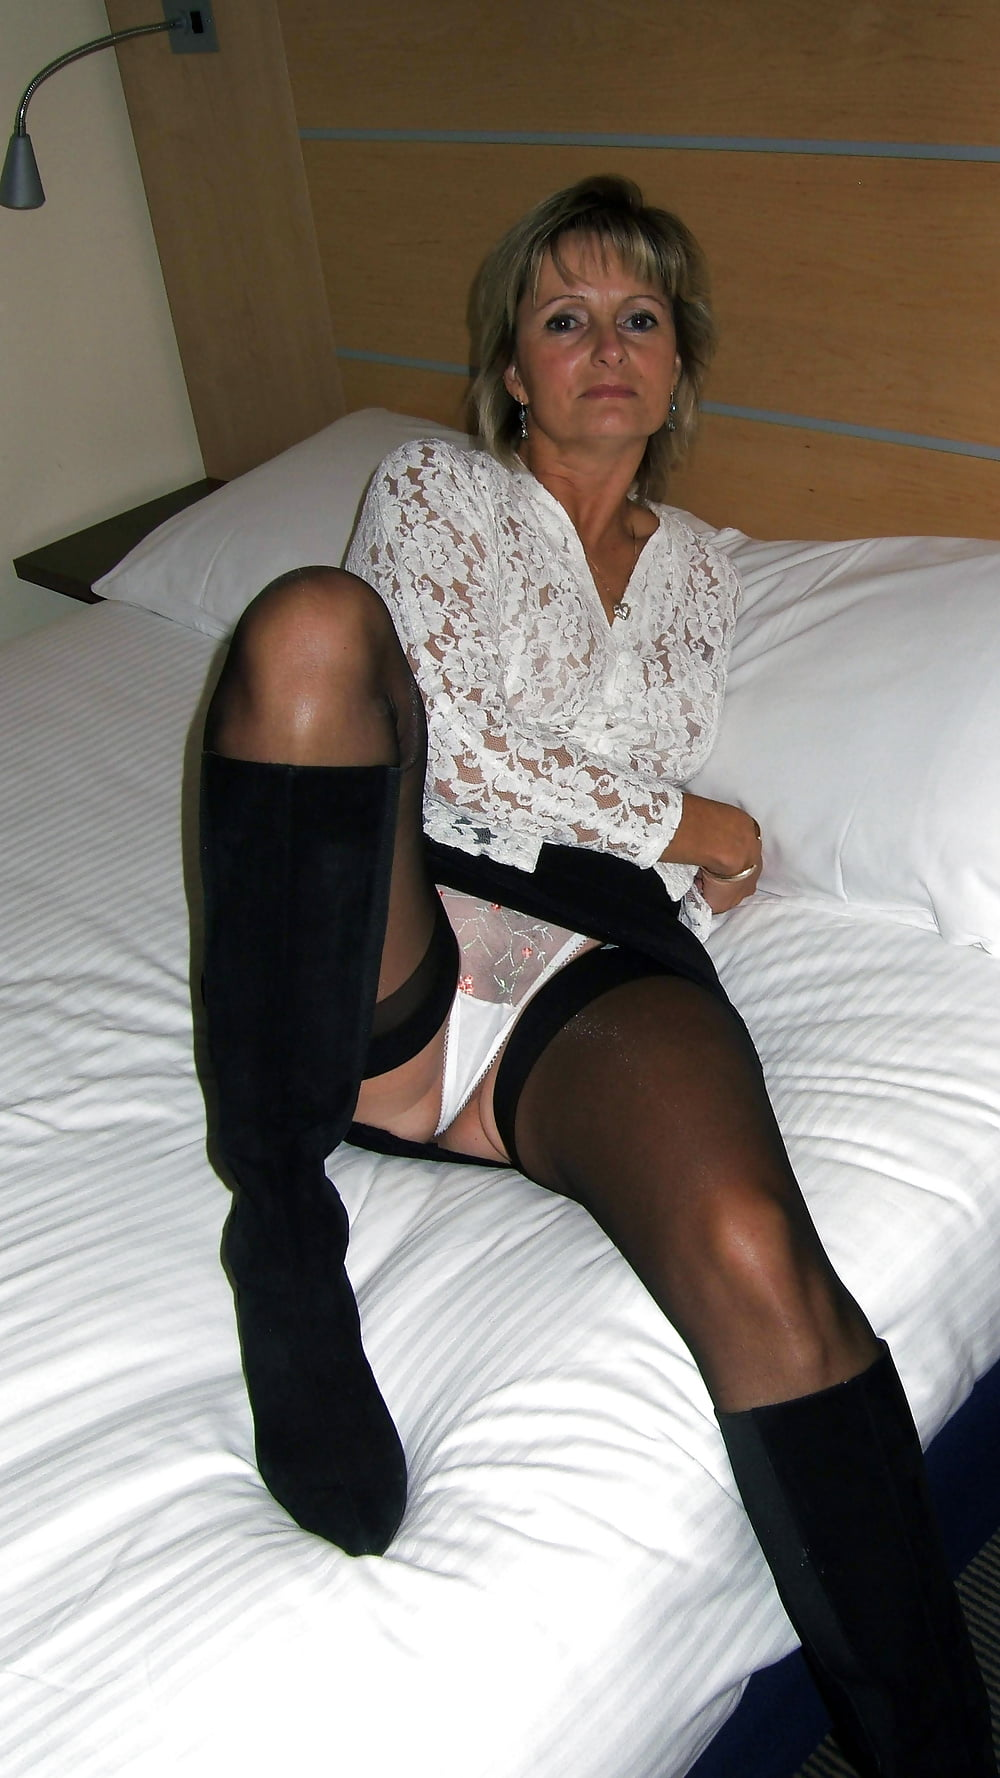 Best Mature Amateur Ladies Wearing White Panties Pix Mix 5 -2995